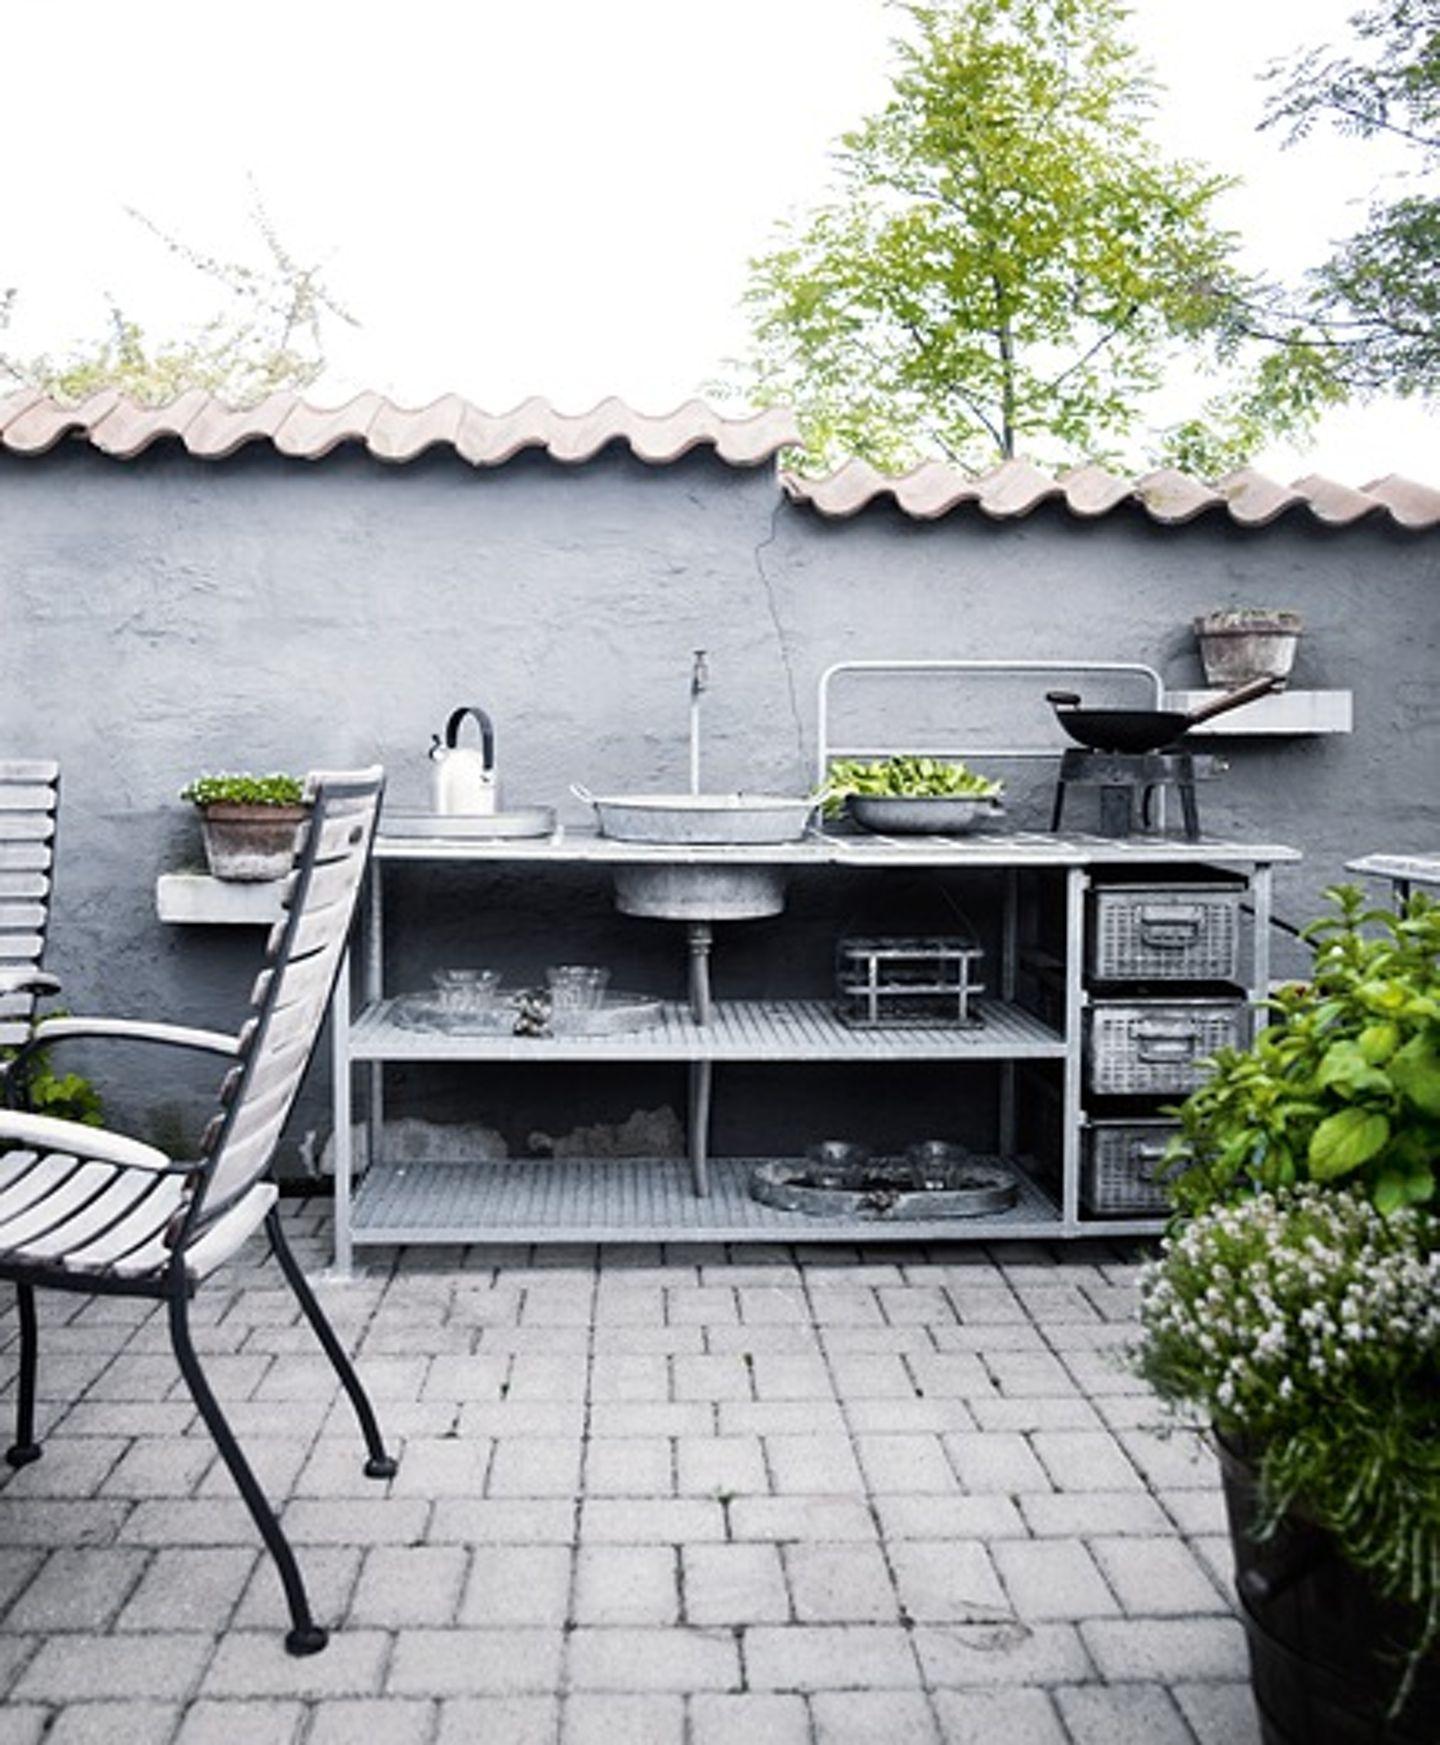 1000+ images about Trädgård Utekök on Pinterest